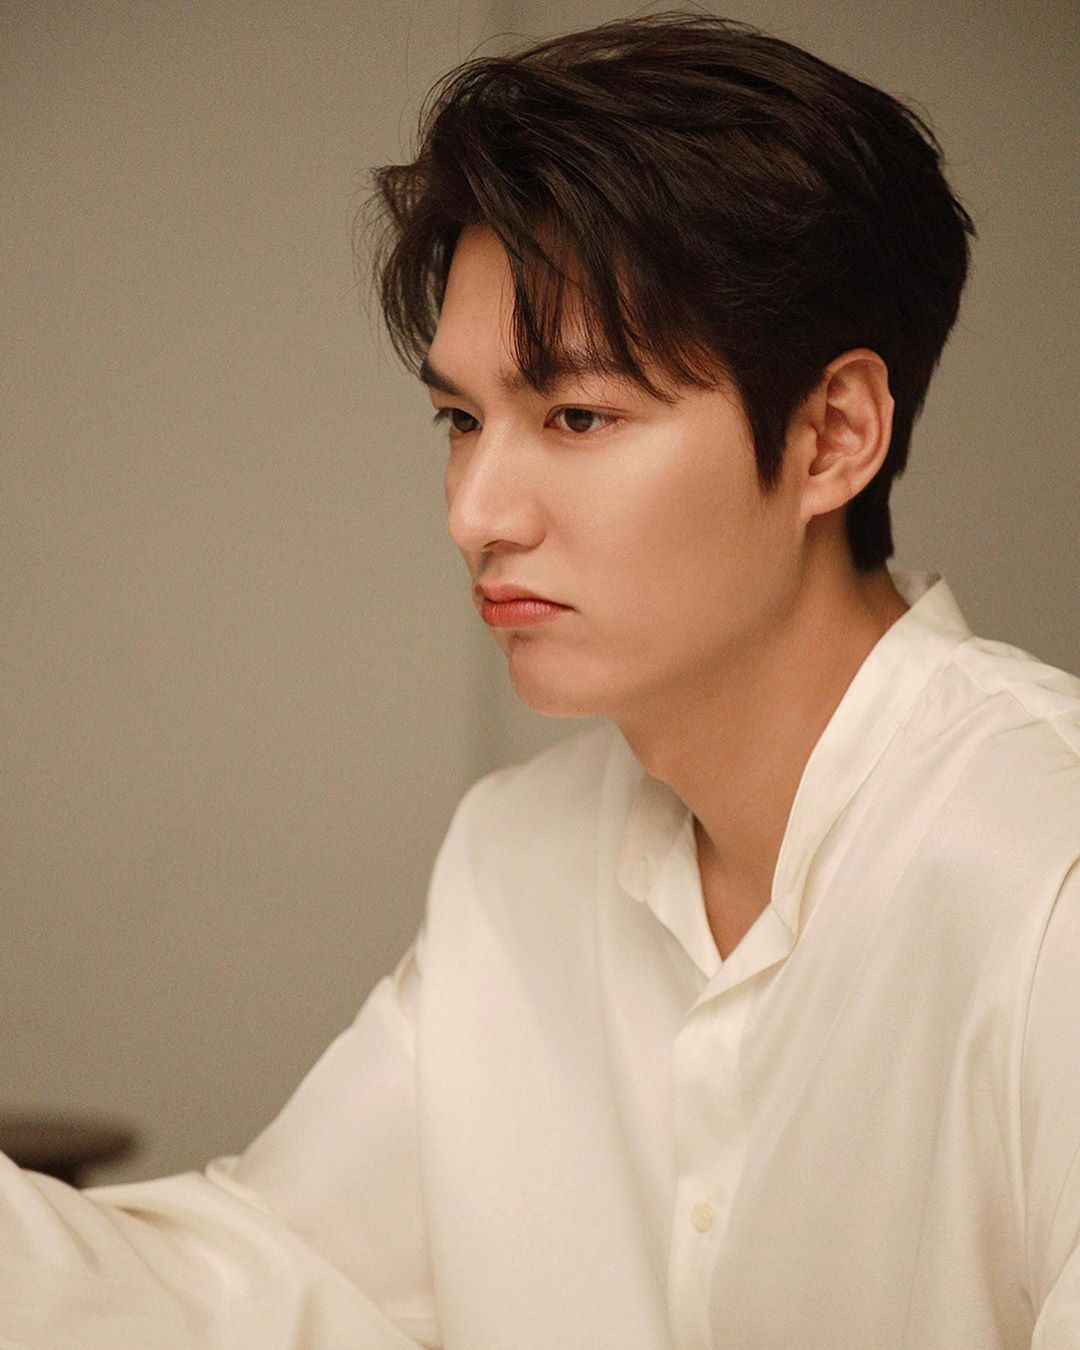 Obnovlenie Mym Intertainment Blog Naver Update Jn 30 01 2020 Aktor Aktor Korea Selebritas